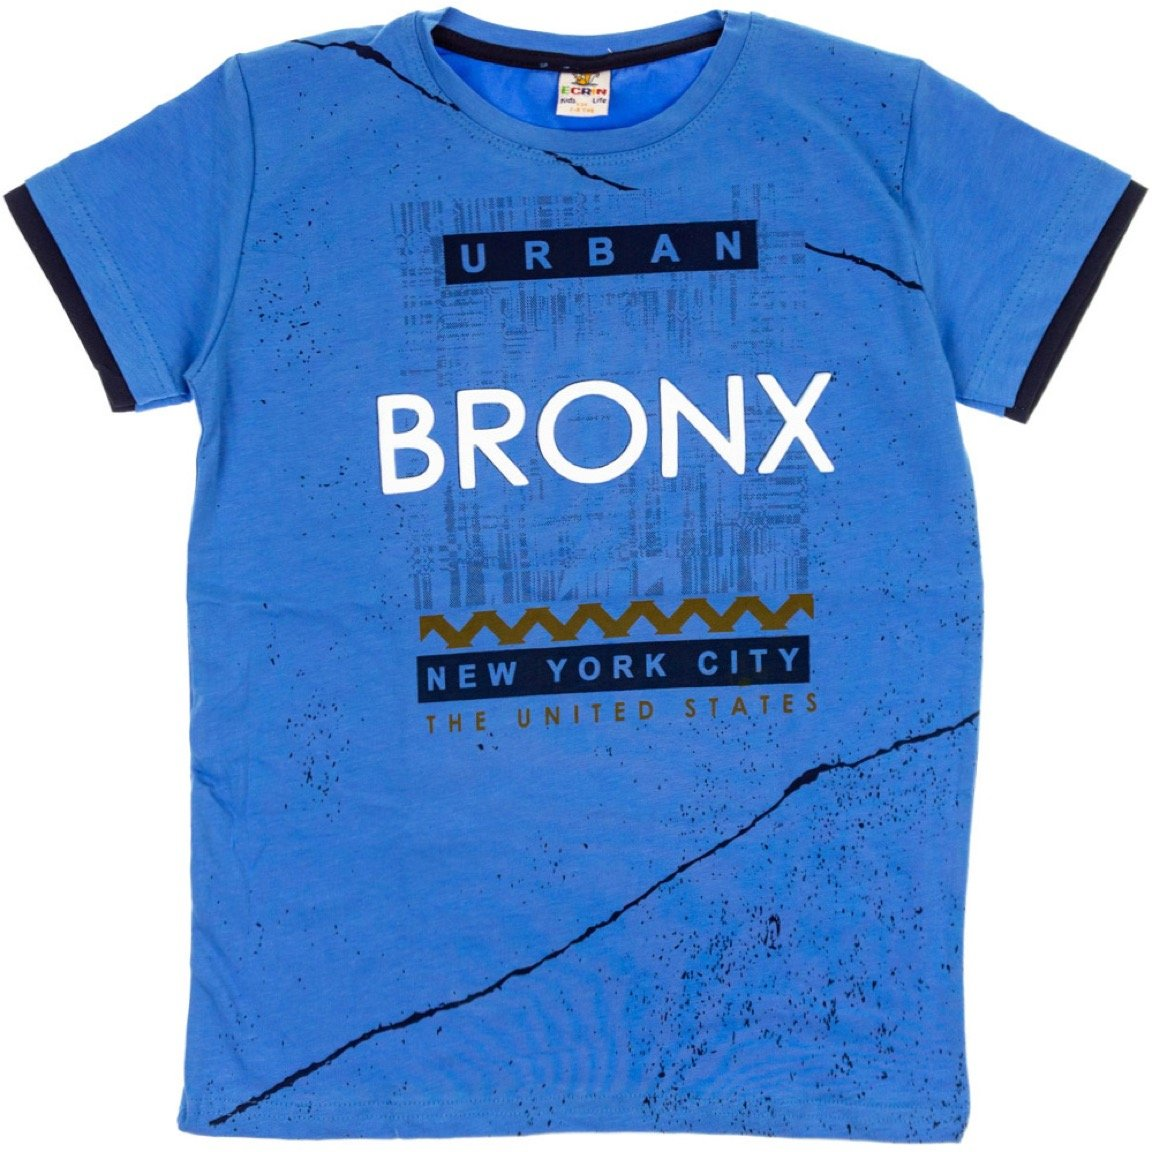 Ecrin παιδική μπλούζα «Urban Bronx»